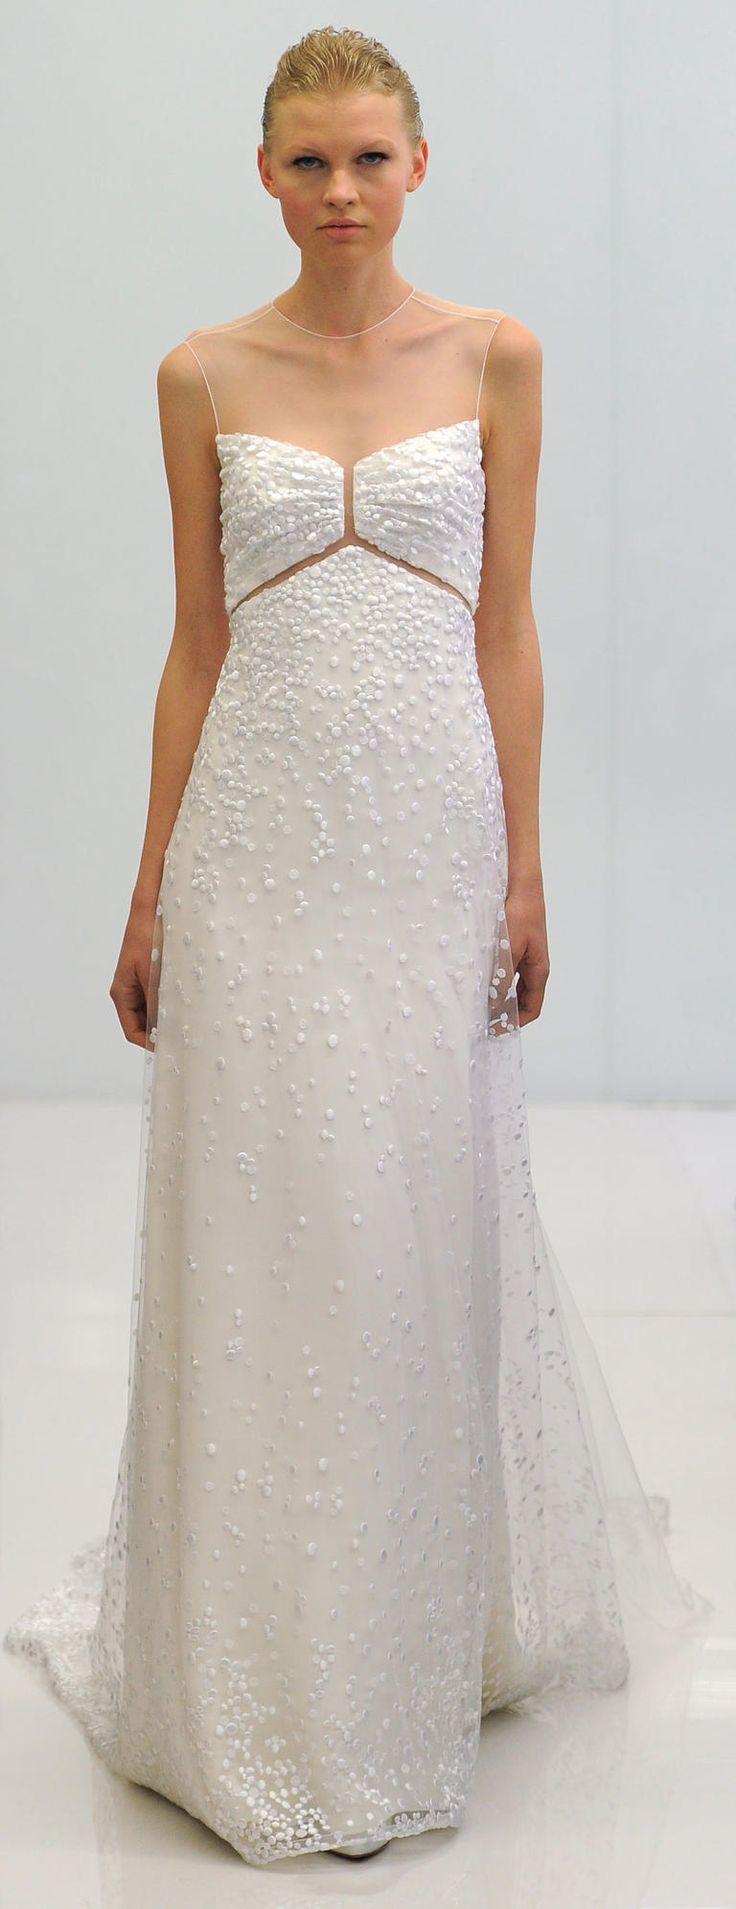 White gown with beading embellishments | Angel Sanchez Spring 2017 | https://www.theknot.com/content/angel-sanchez-wedding-dresses-bridal-fashion-week-spring-2017